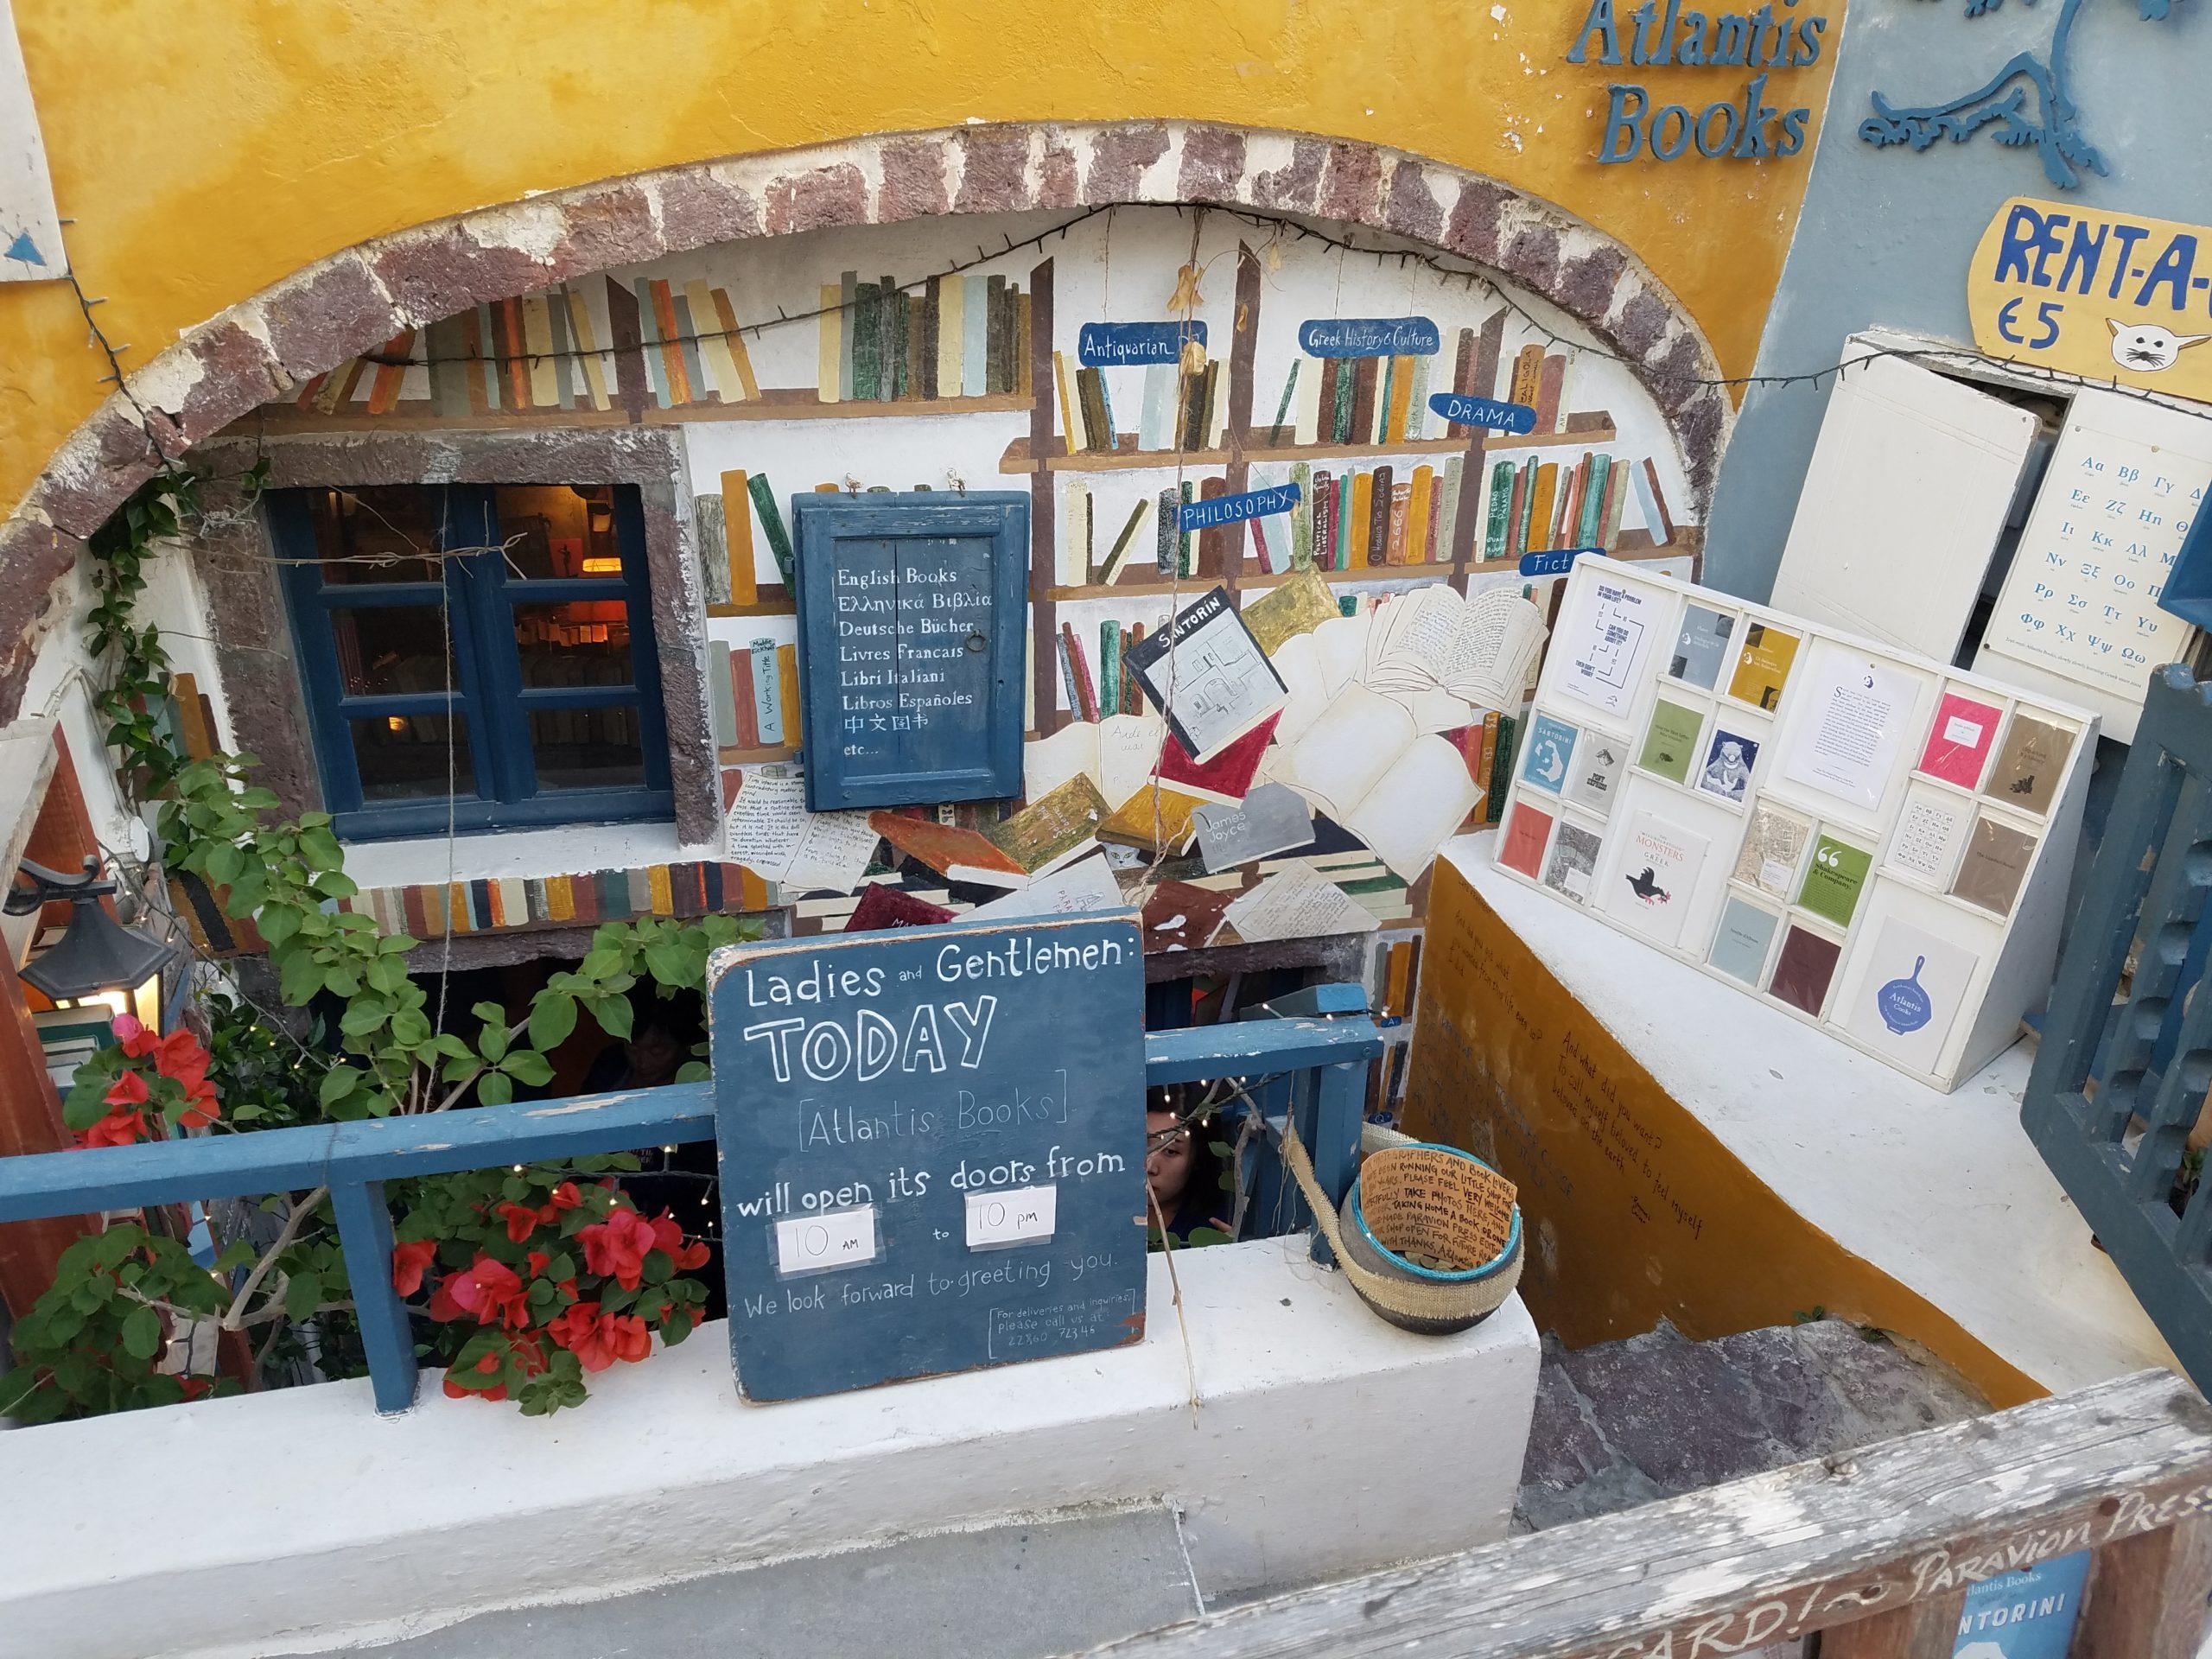 Atlantis Book Store Santorini